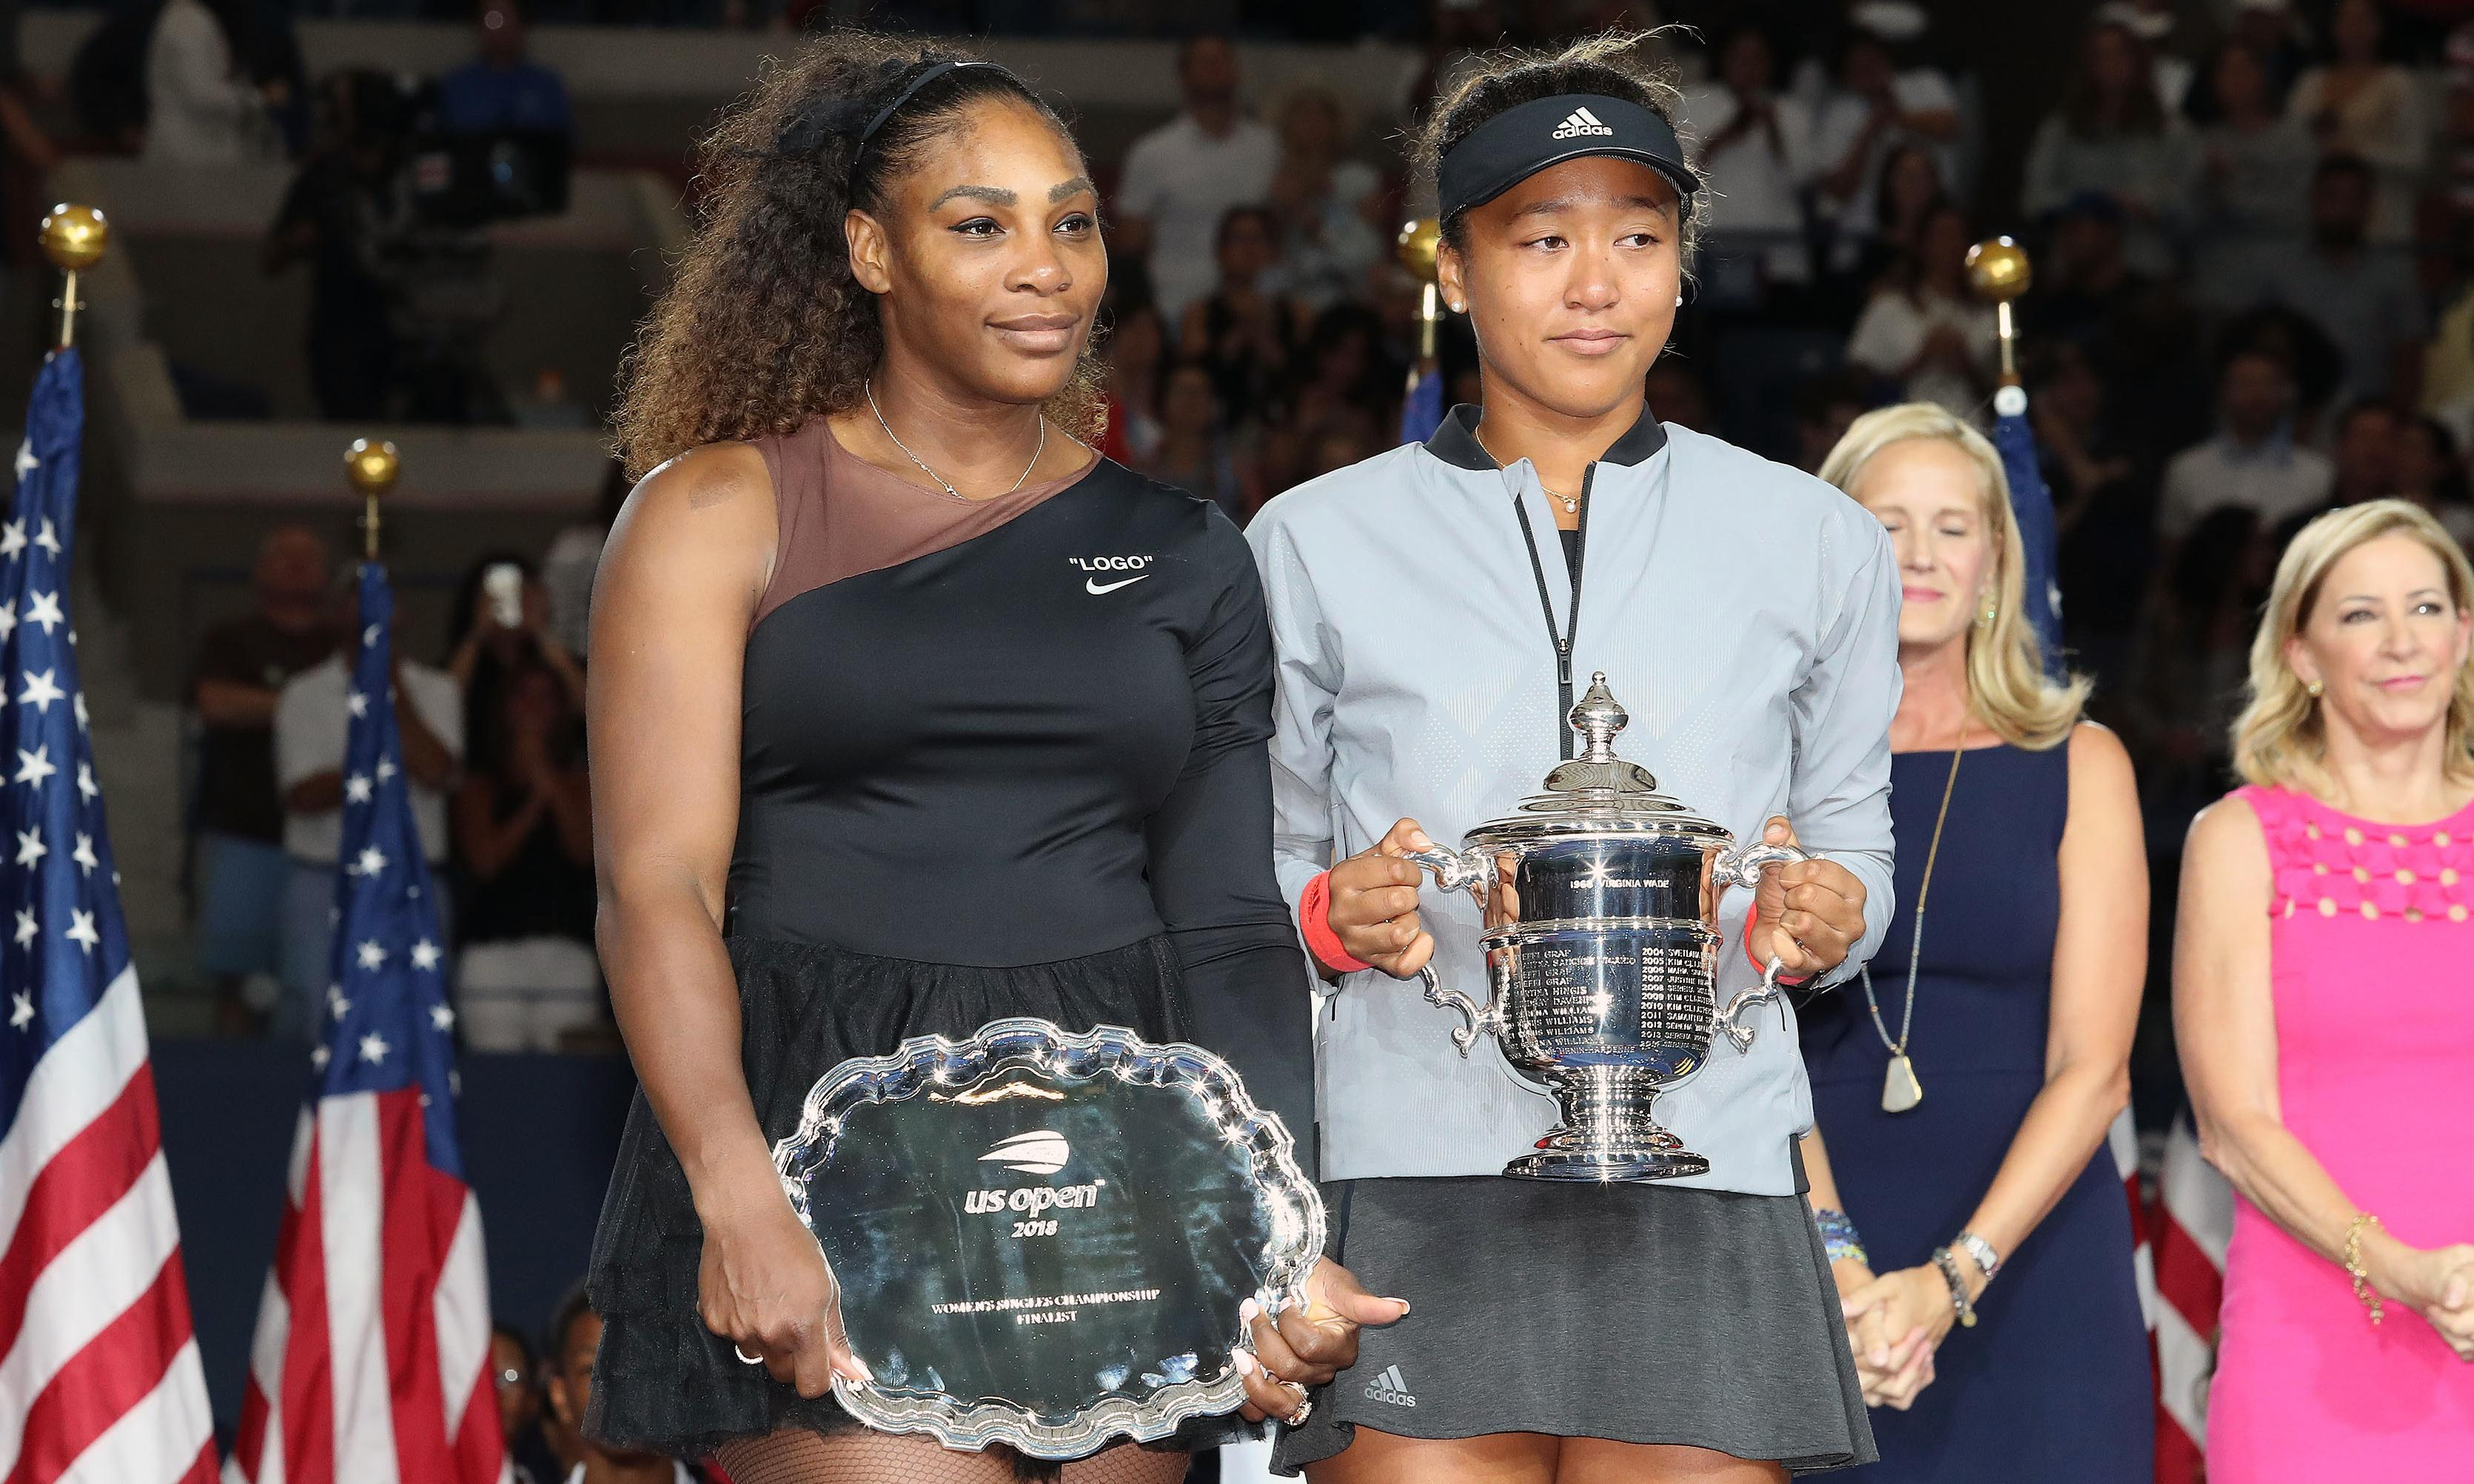 'Repugnant, racist': News Corp cartoon on Serena Williams condemned